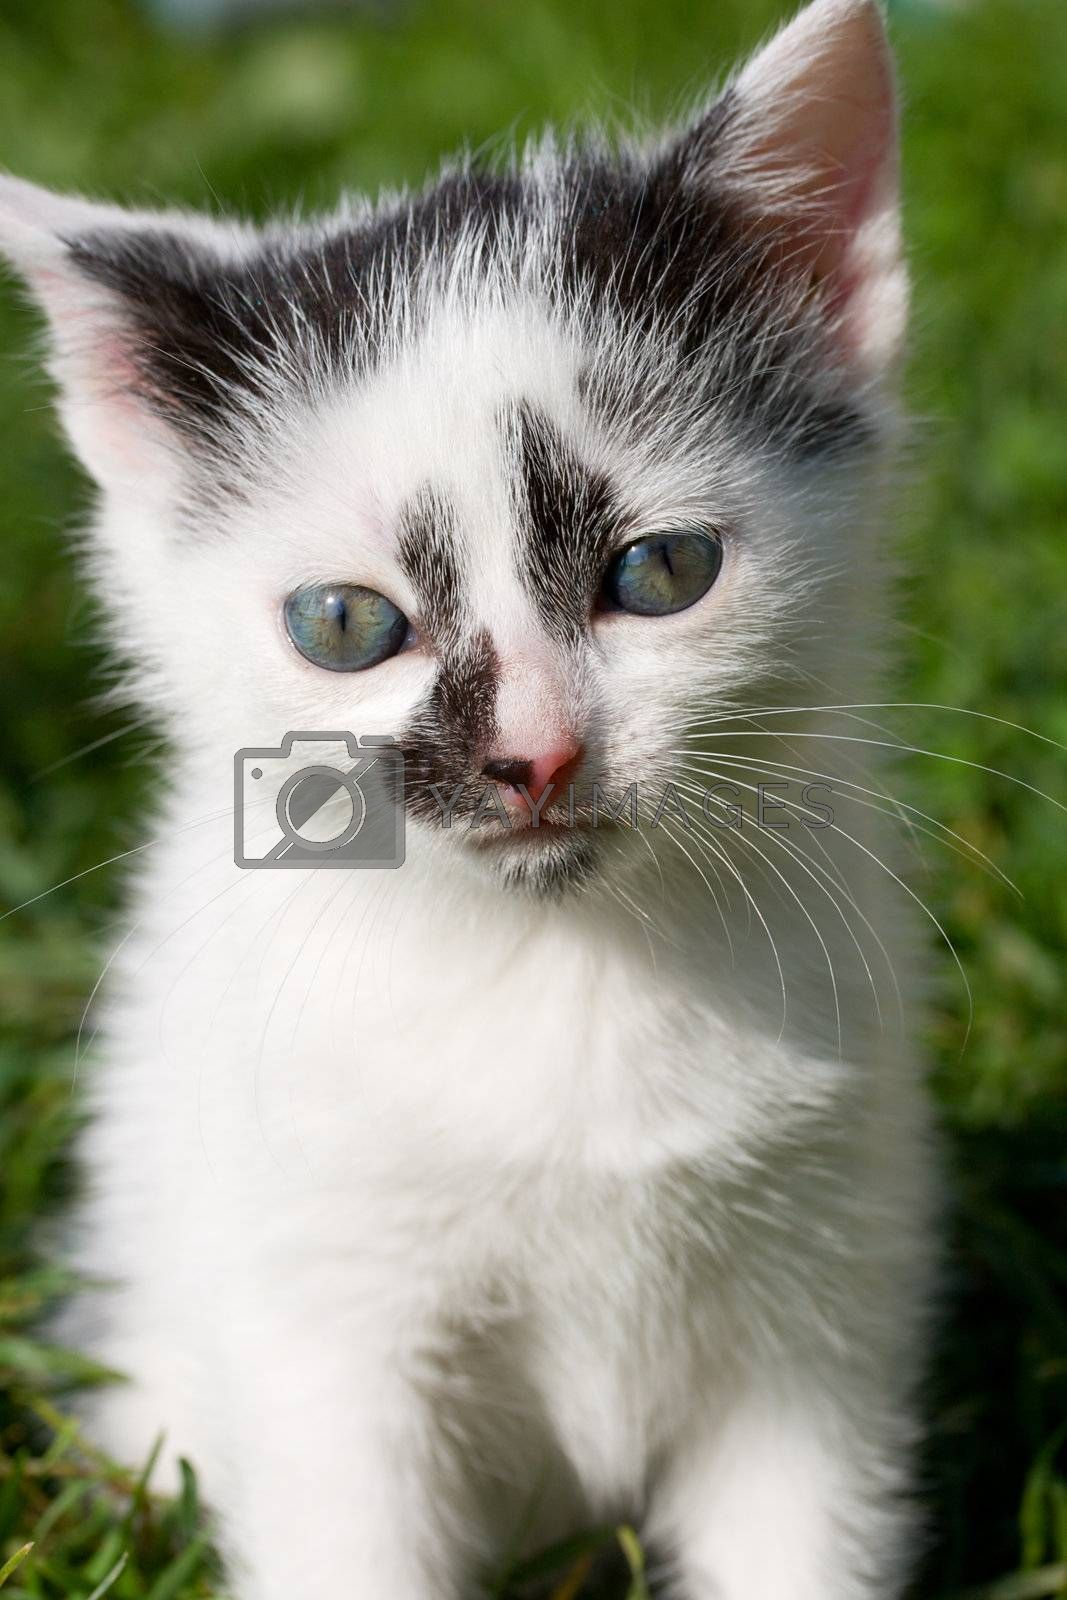 close-up sitting kitten on green grass background